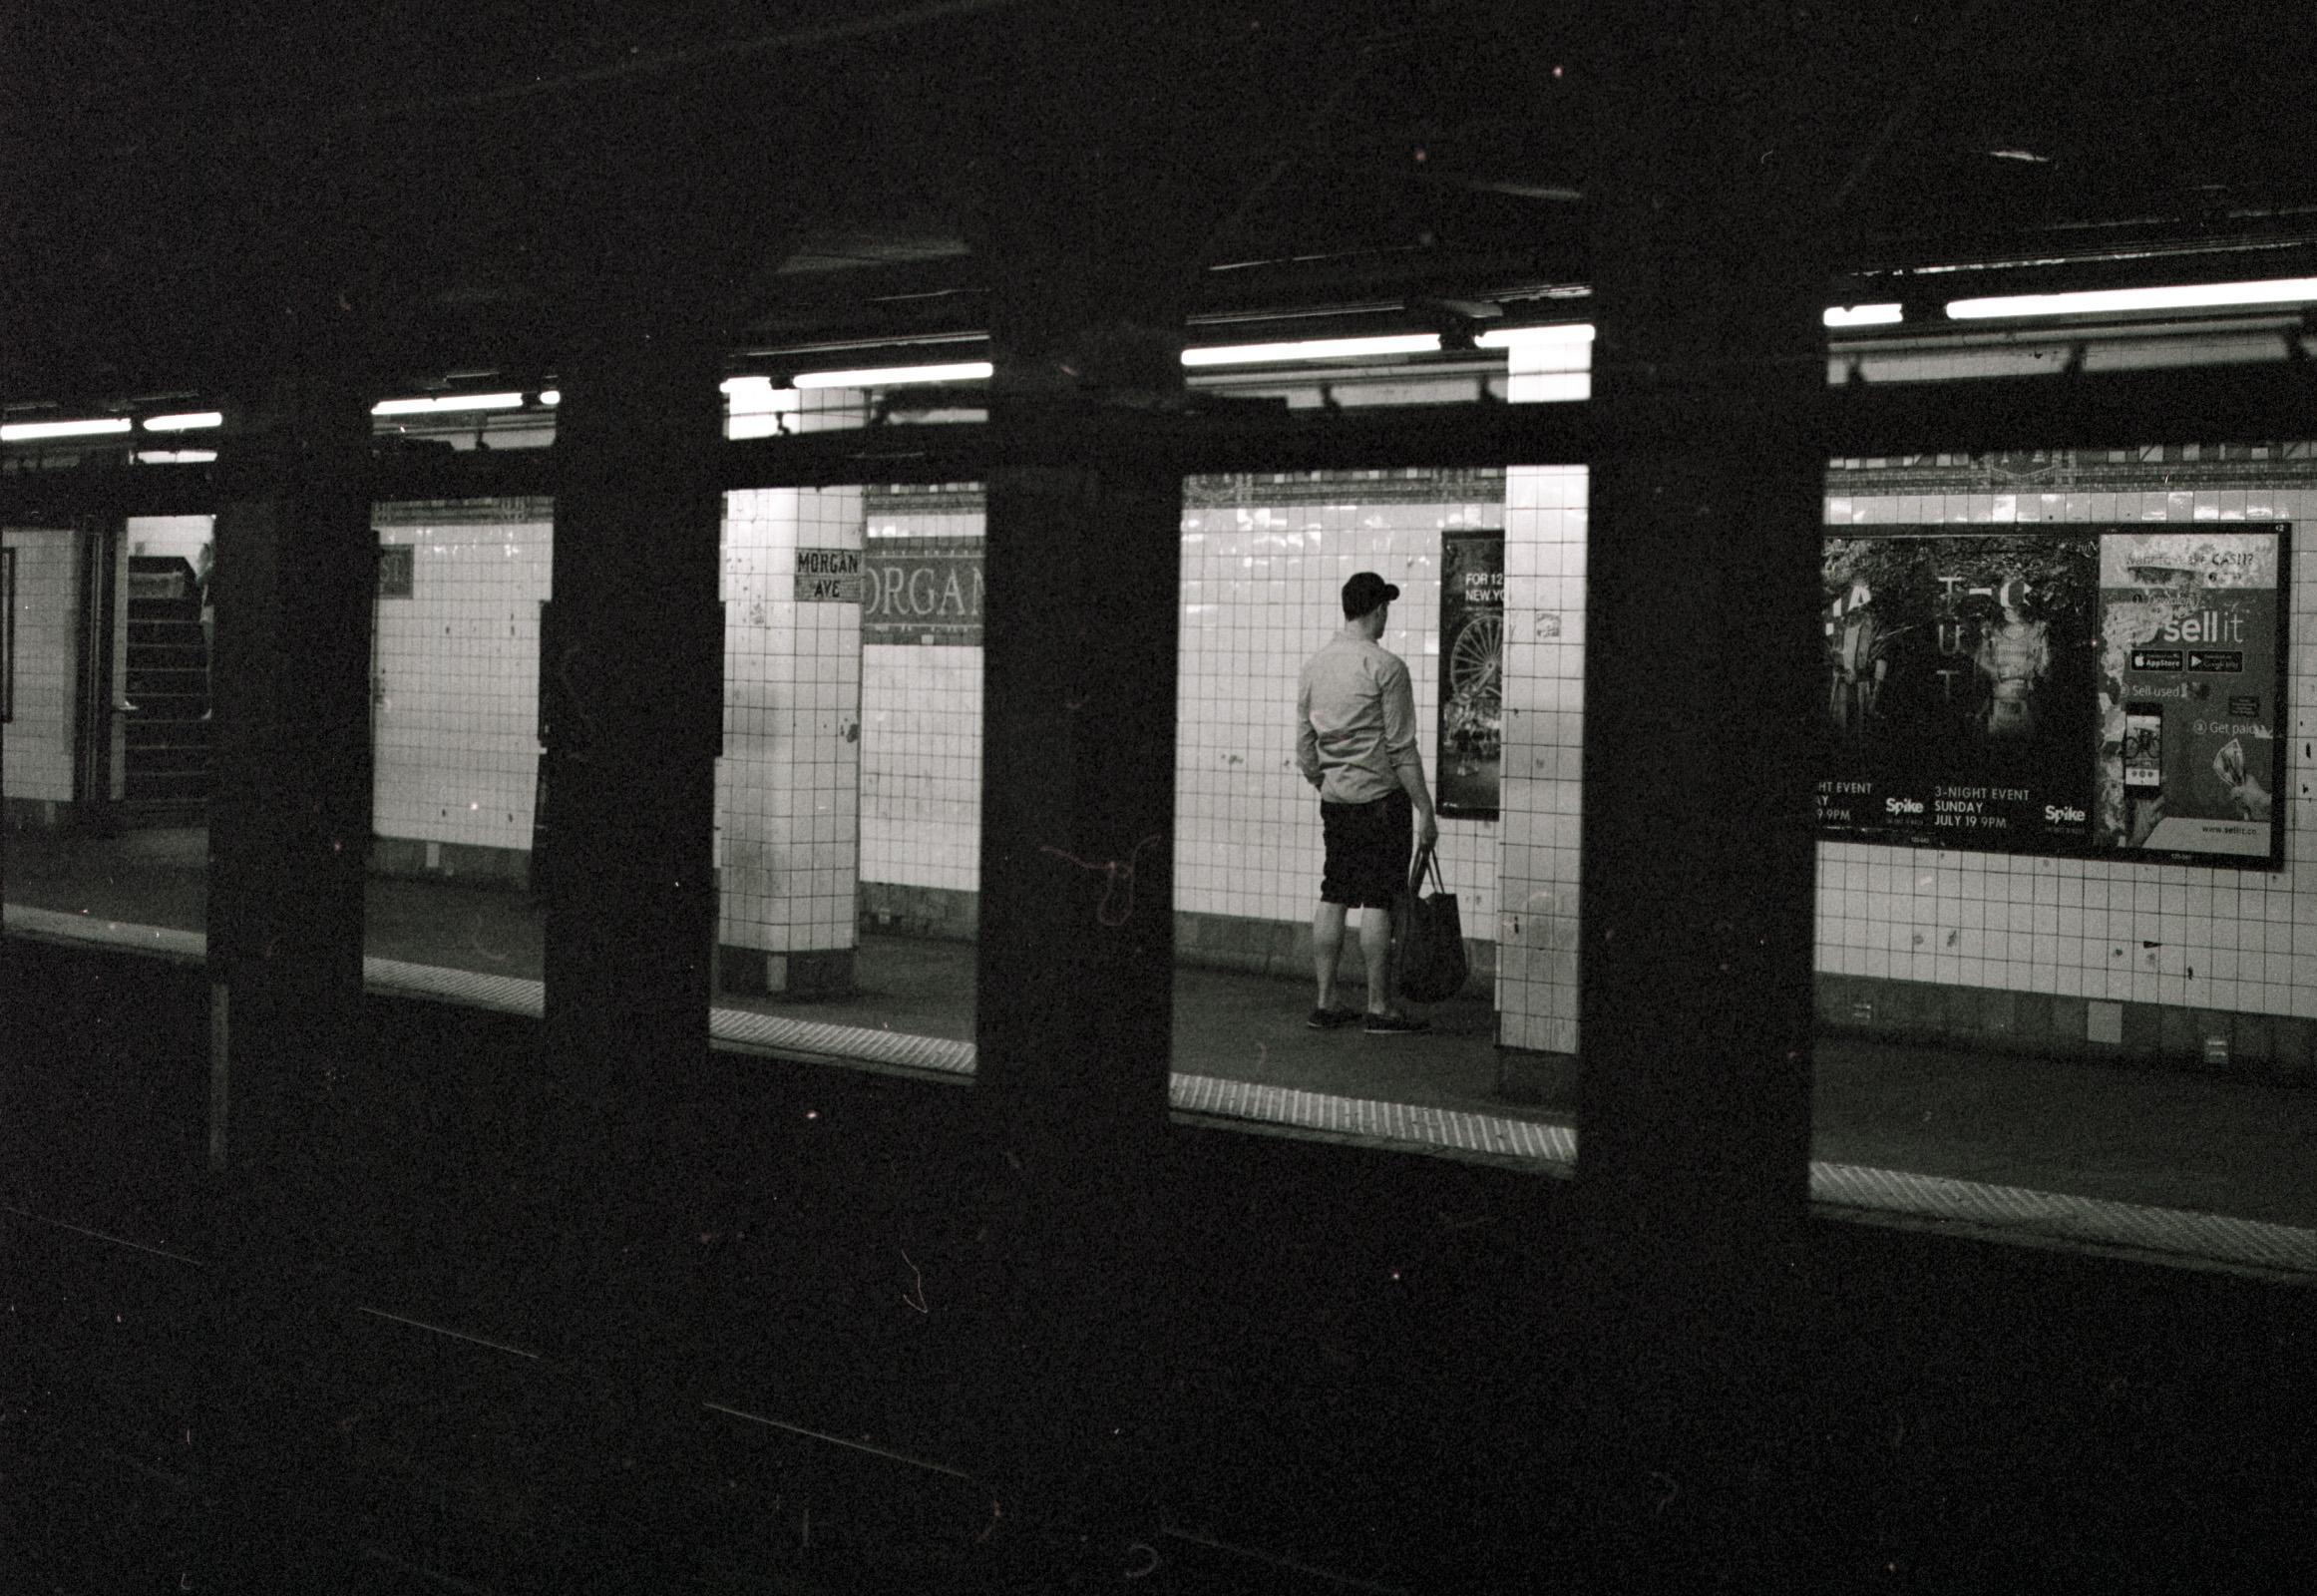 Waitin' on the train.